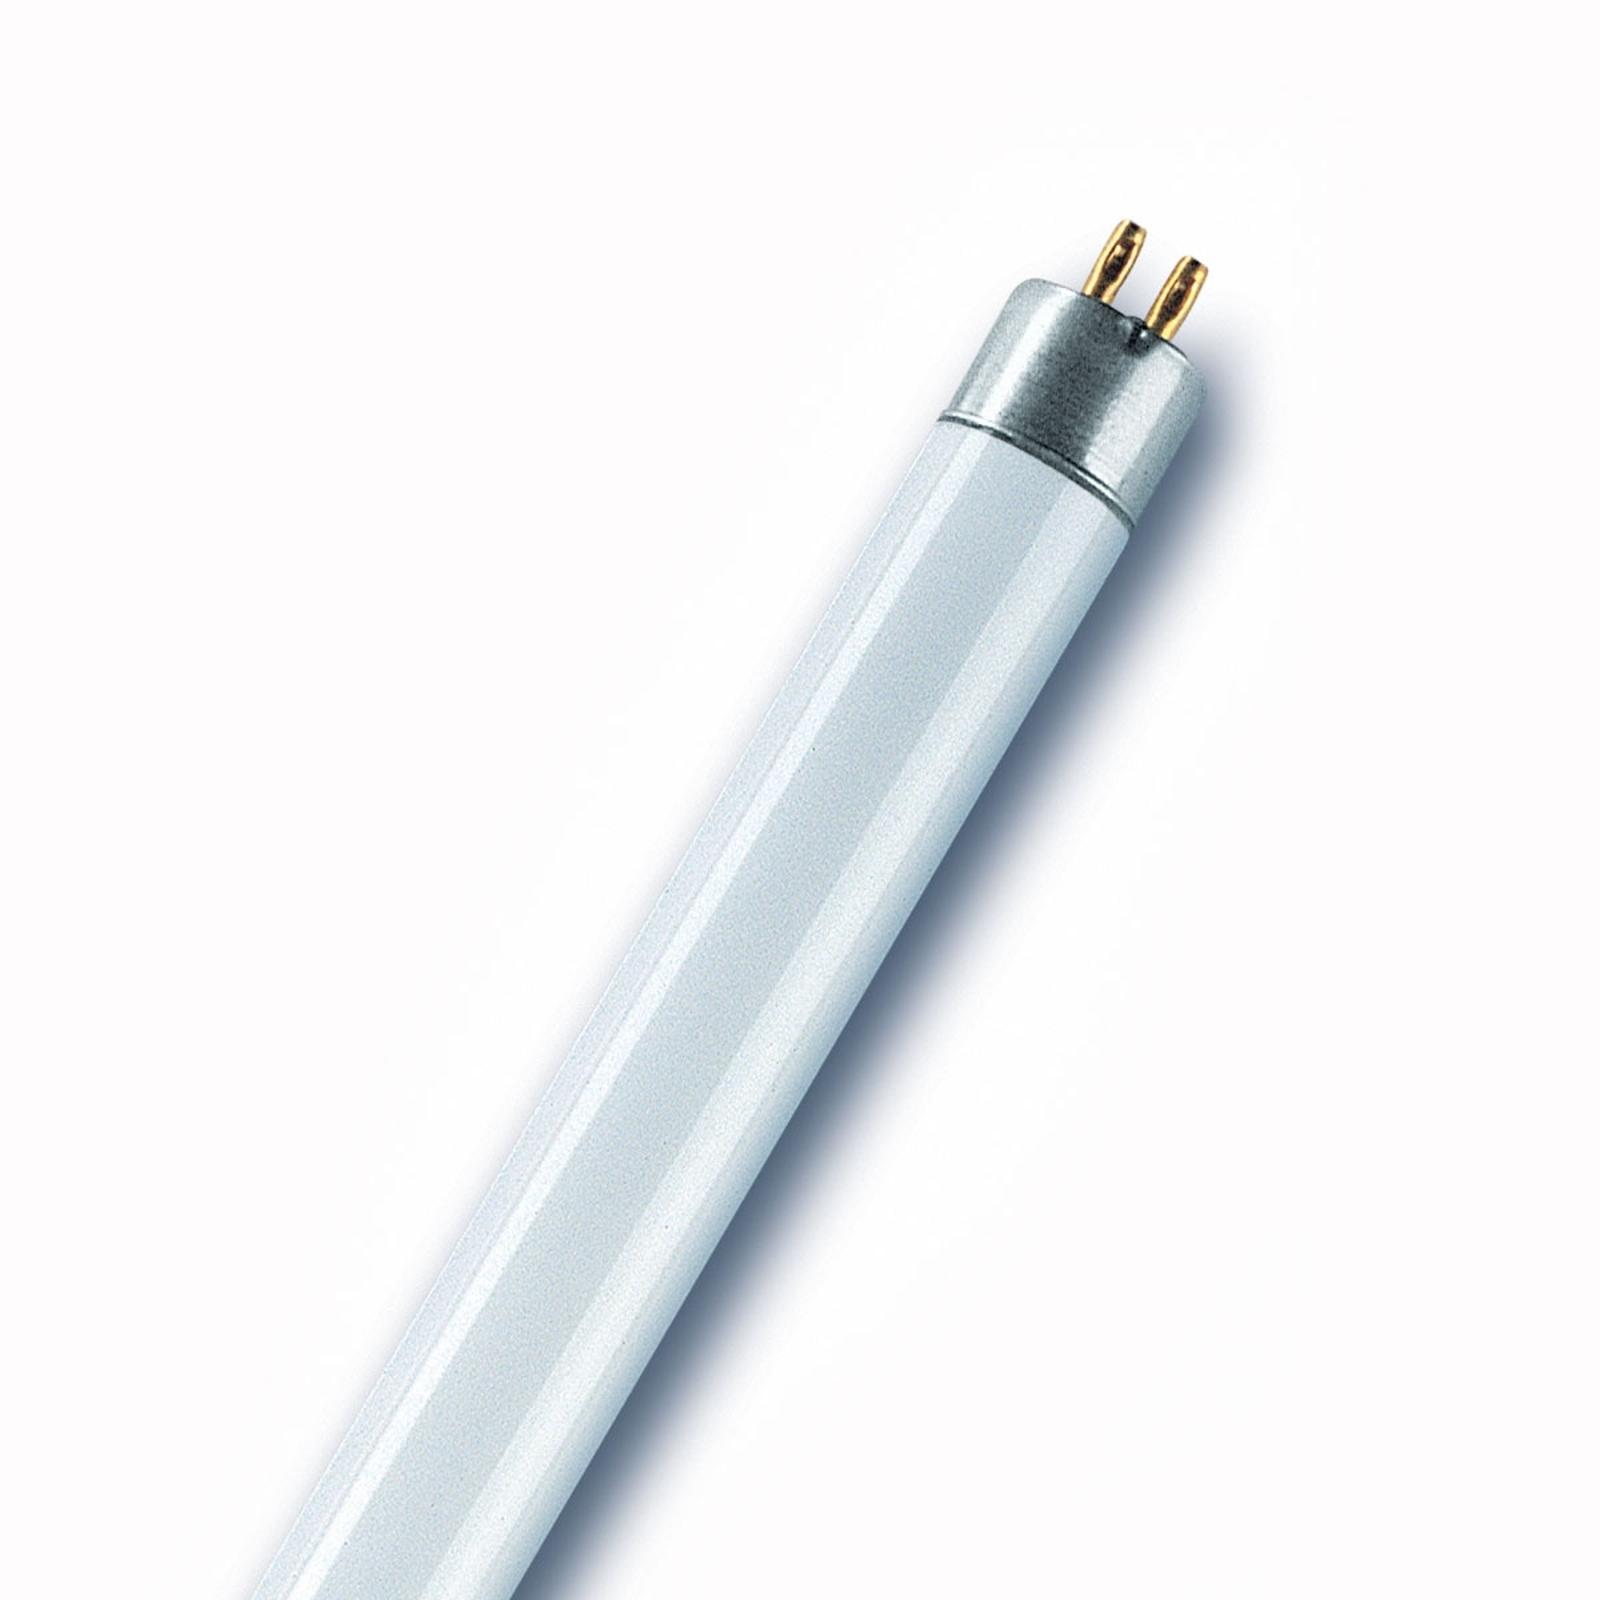 Leuchtstoffröhre G5 T5 39W 830 Lumilux HO